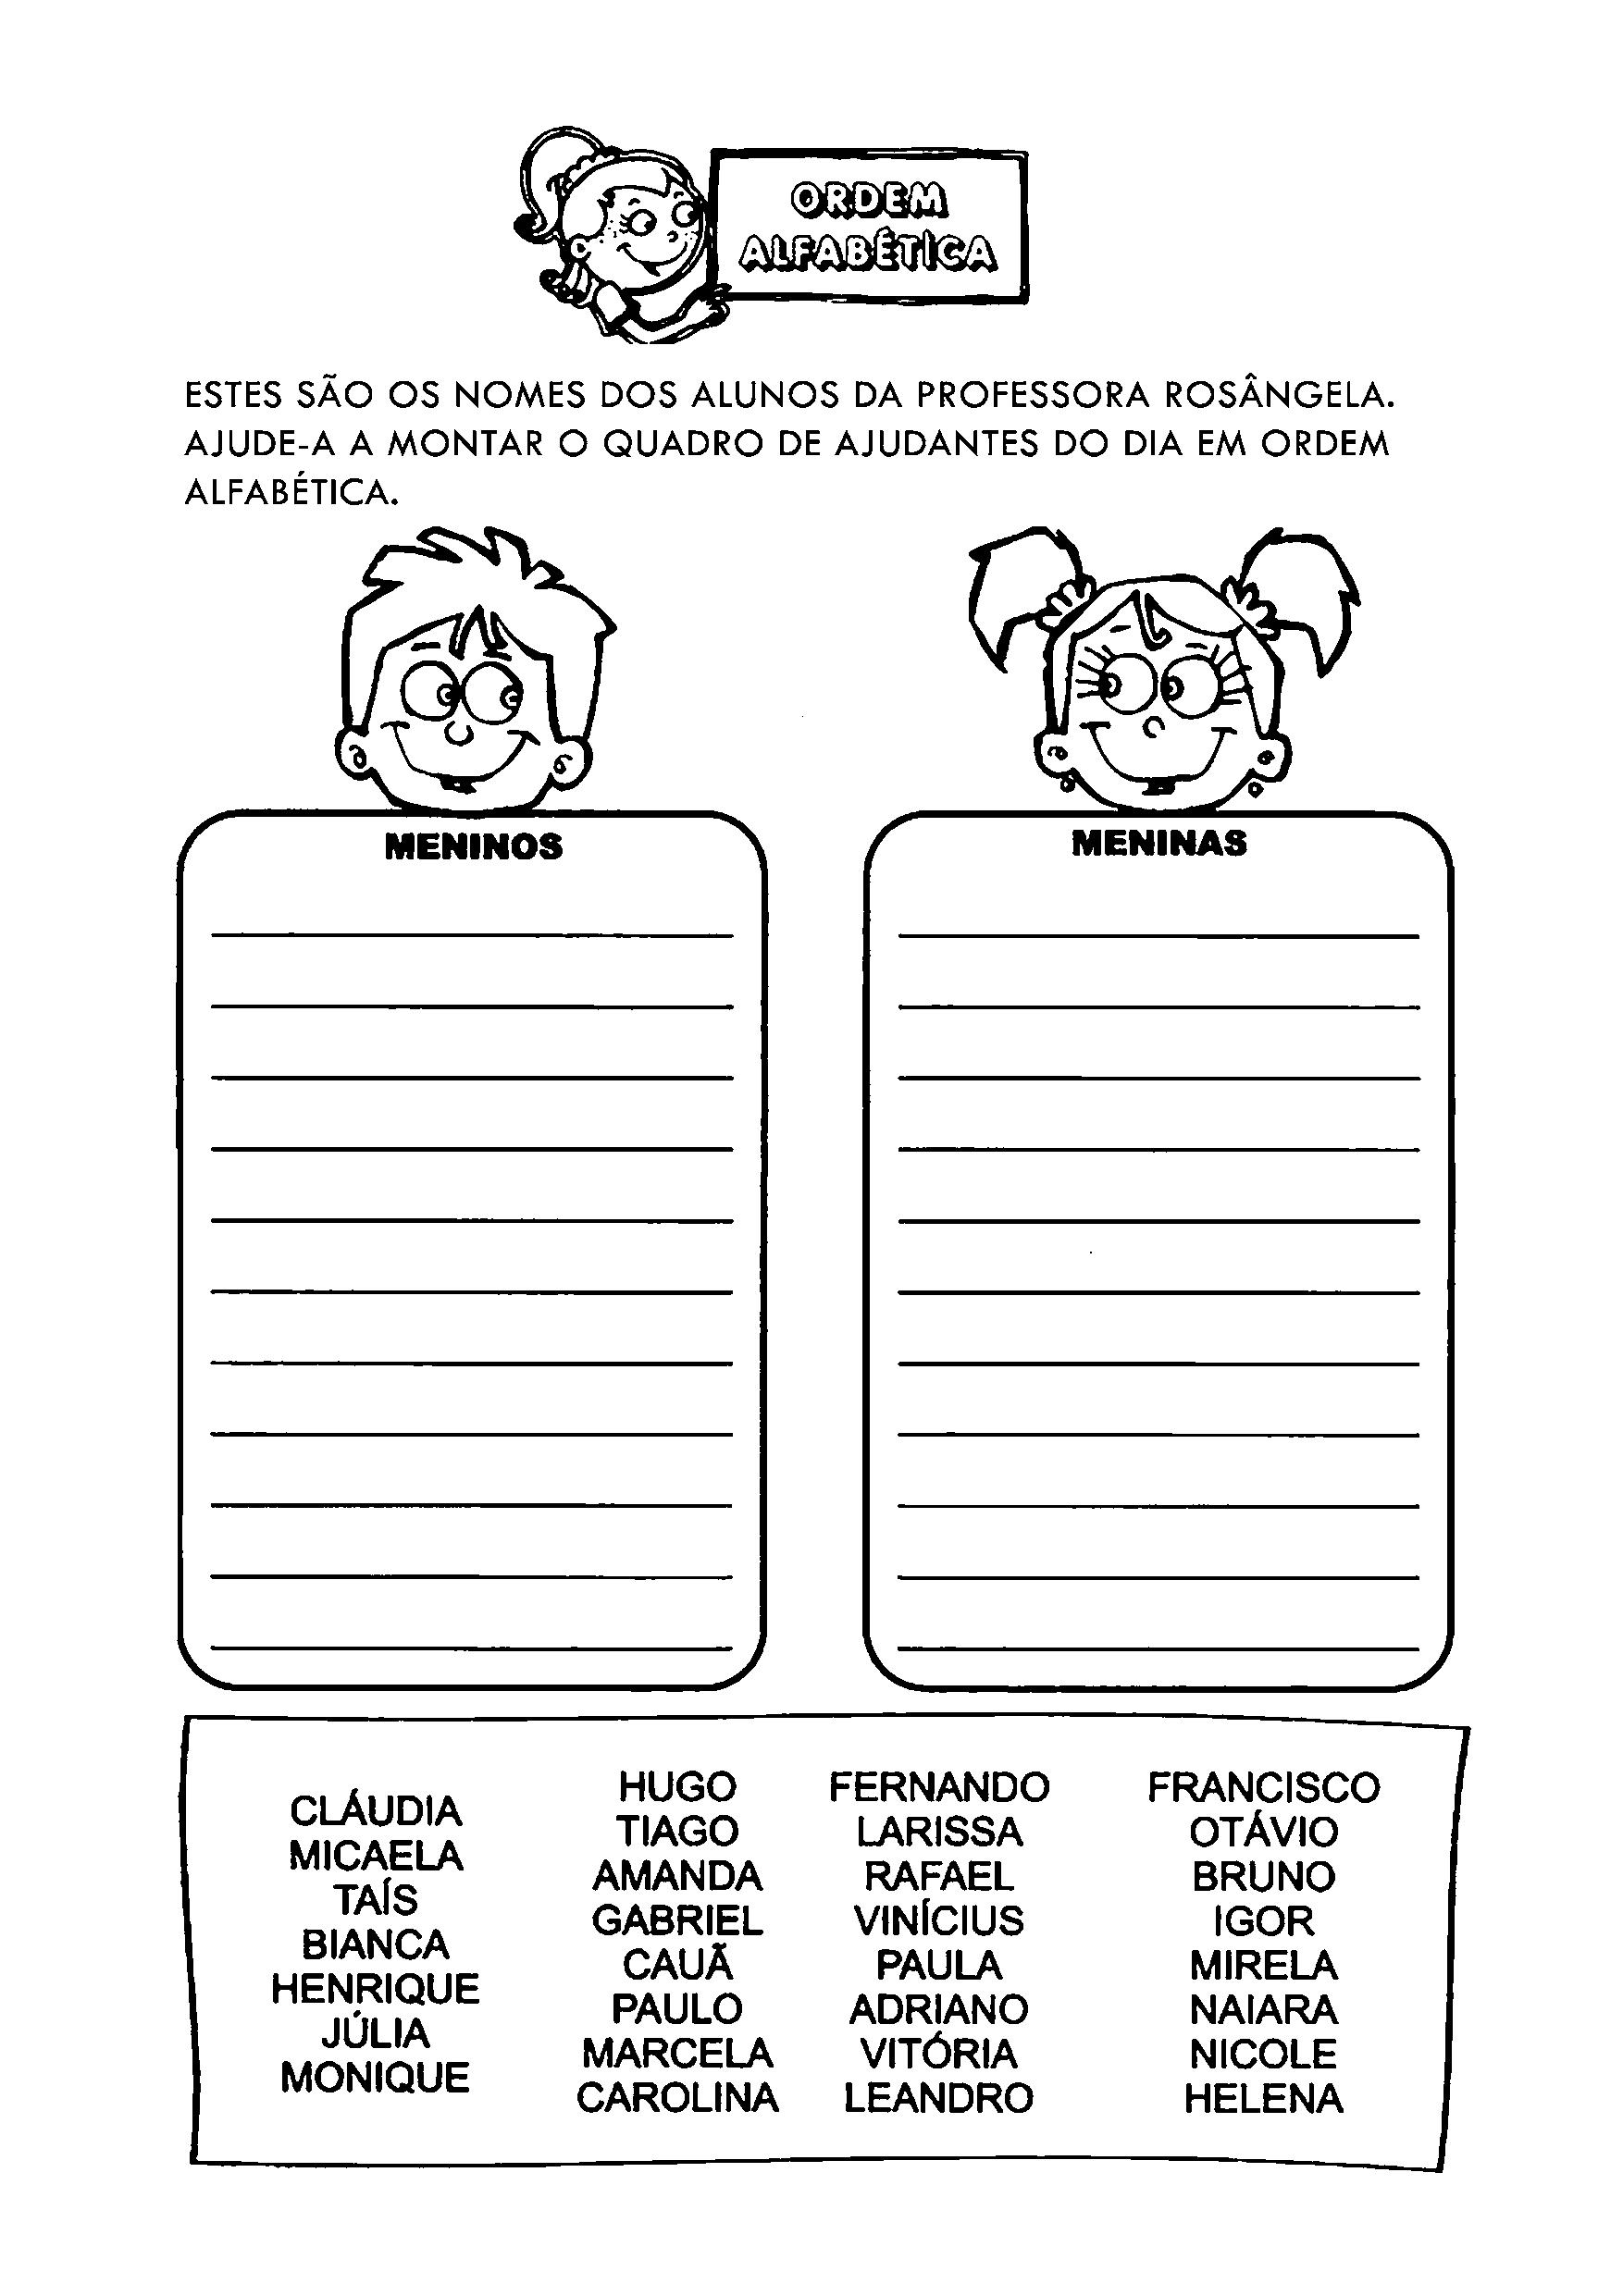 Colocar nomes em ordem alfabética